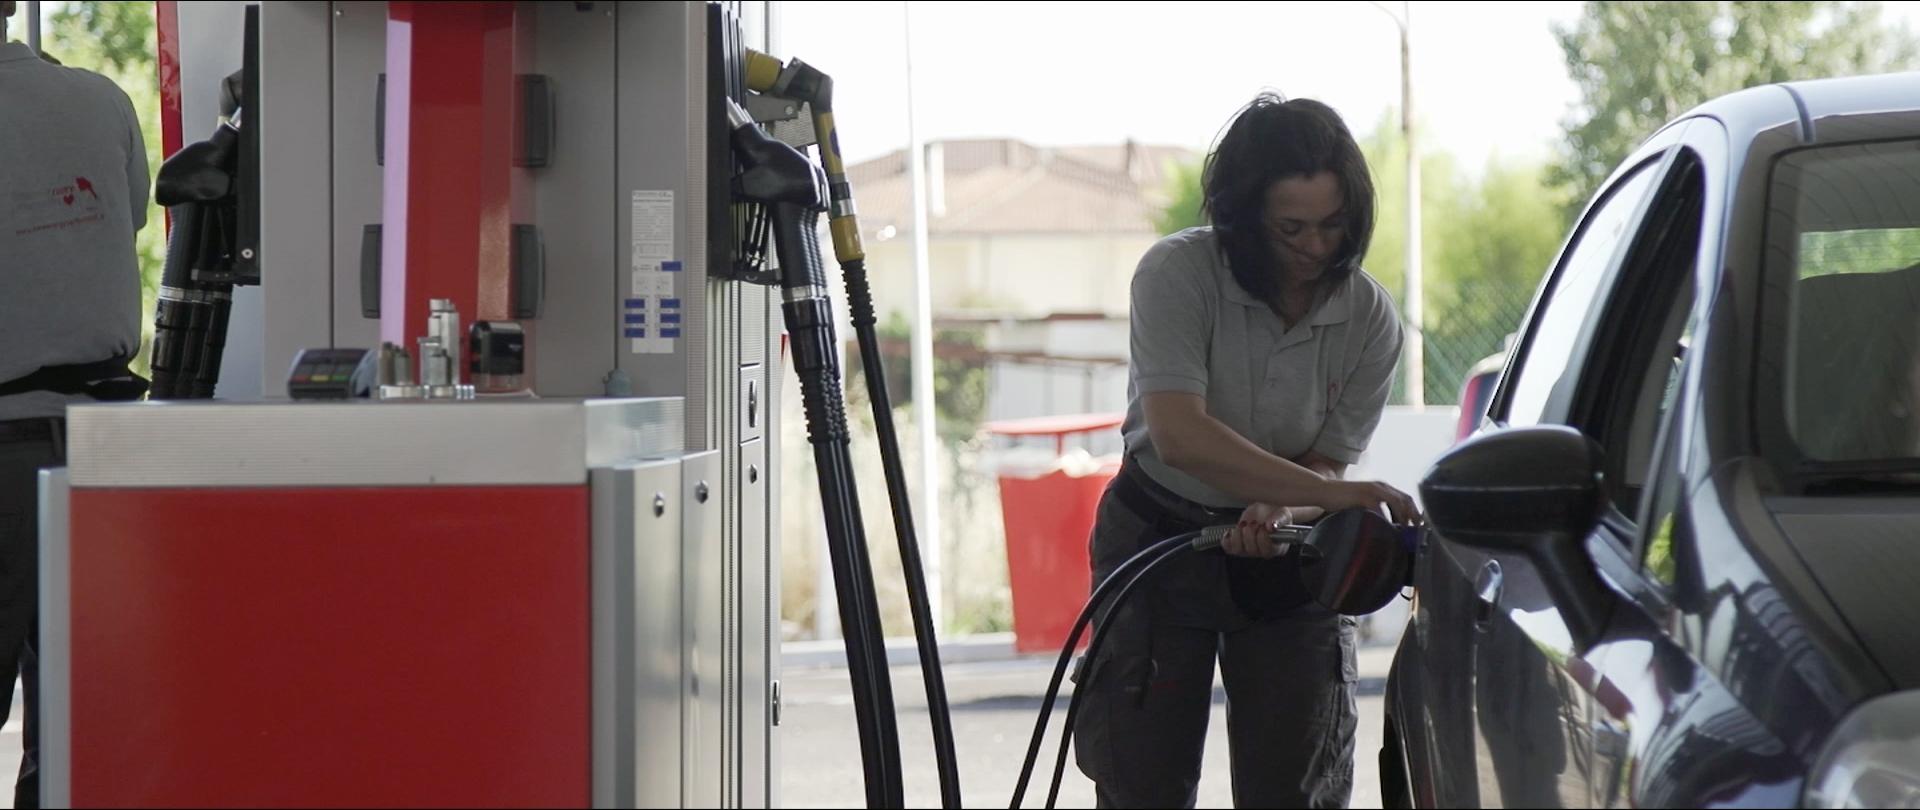 https://www.newenergycarburanti.it/wp-content/uploads/2017/03/Metano-1.jpg